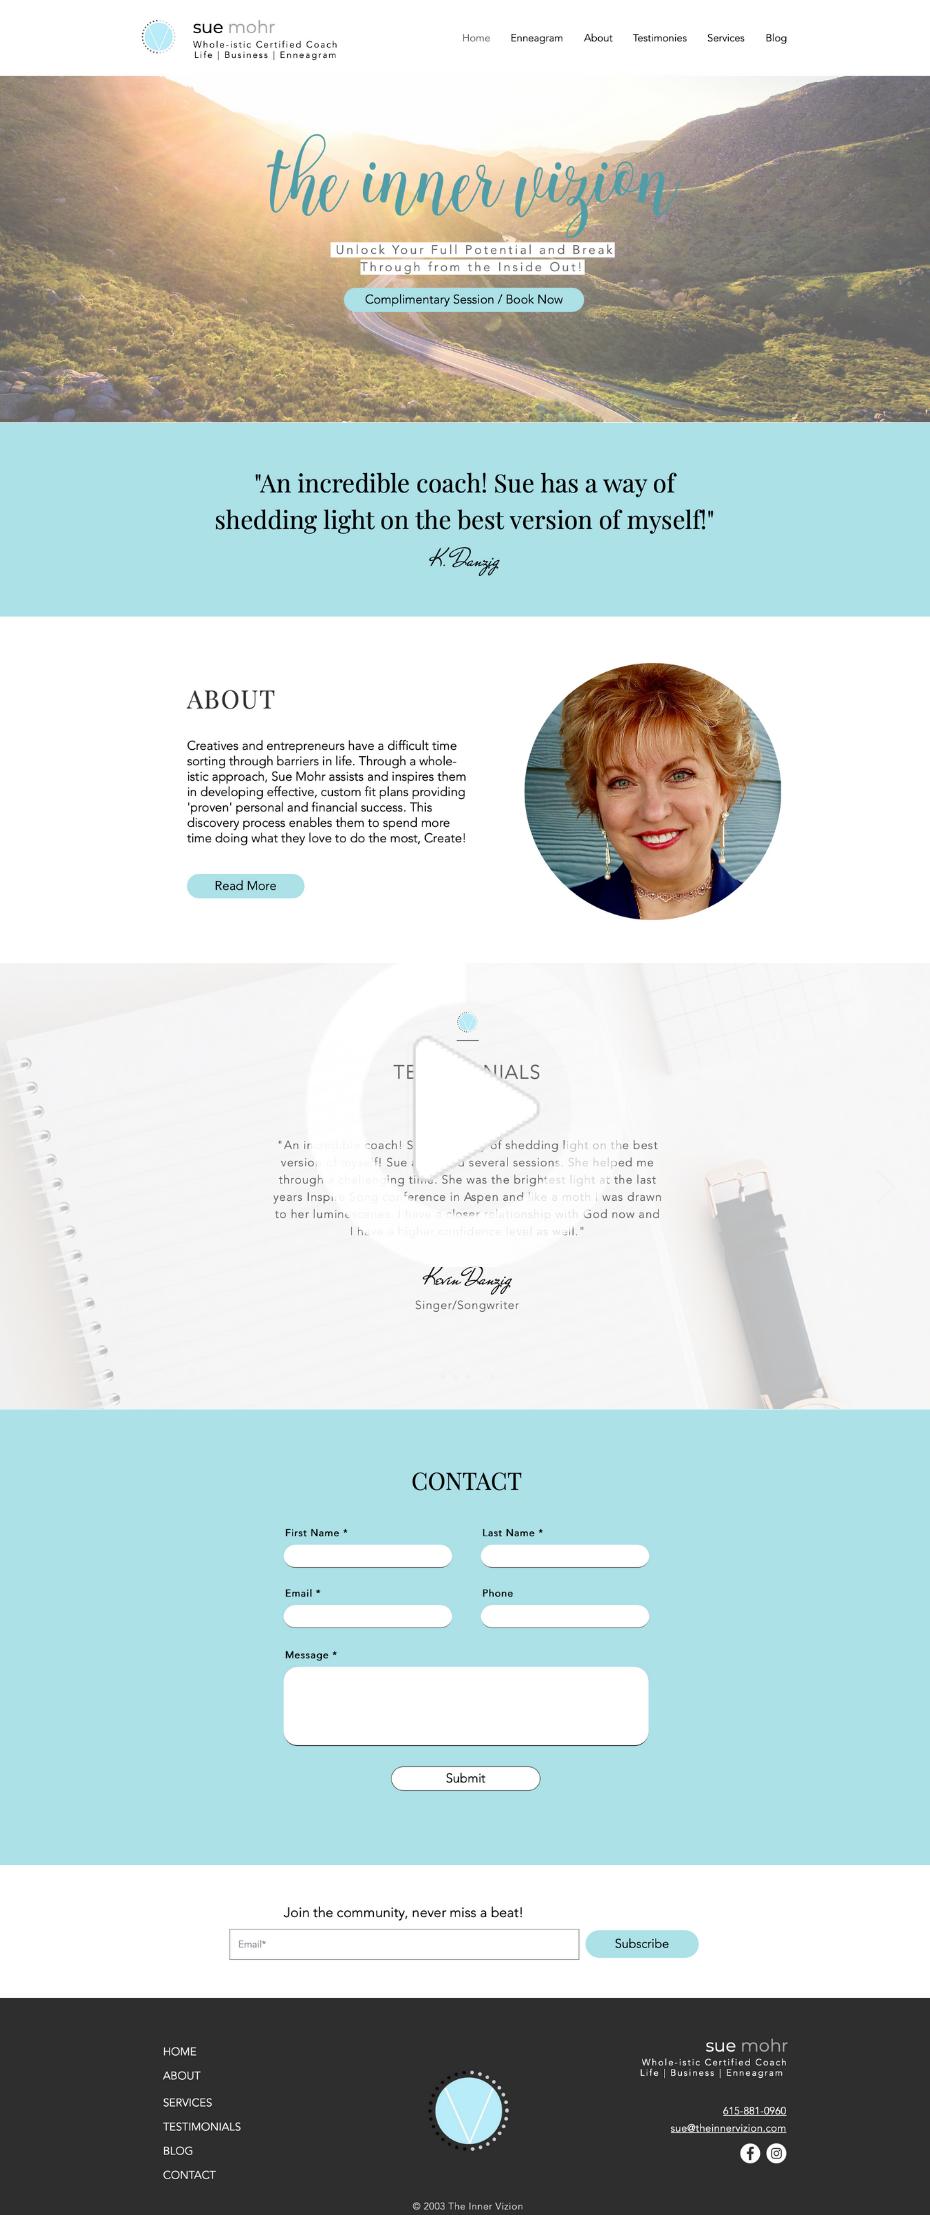 Web Design By Abigail Ann Minimal Web Design Portfolio Web Design Portfolio Website Design